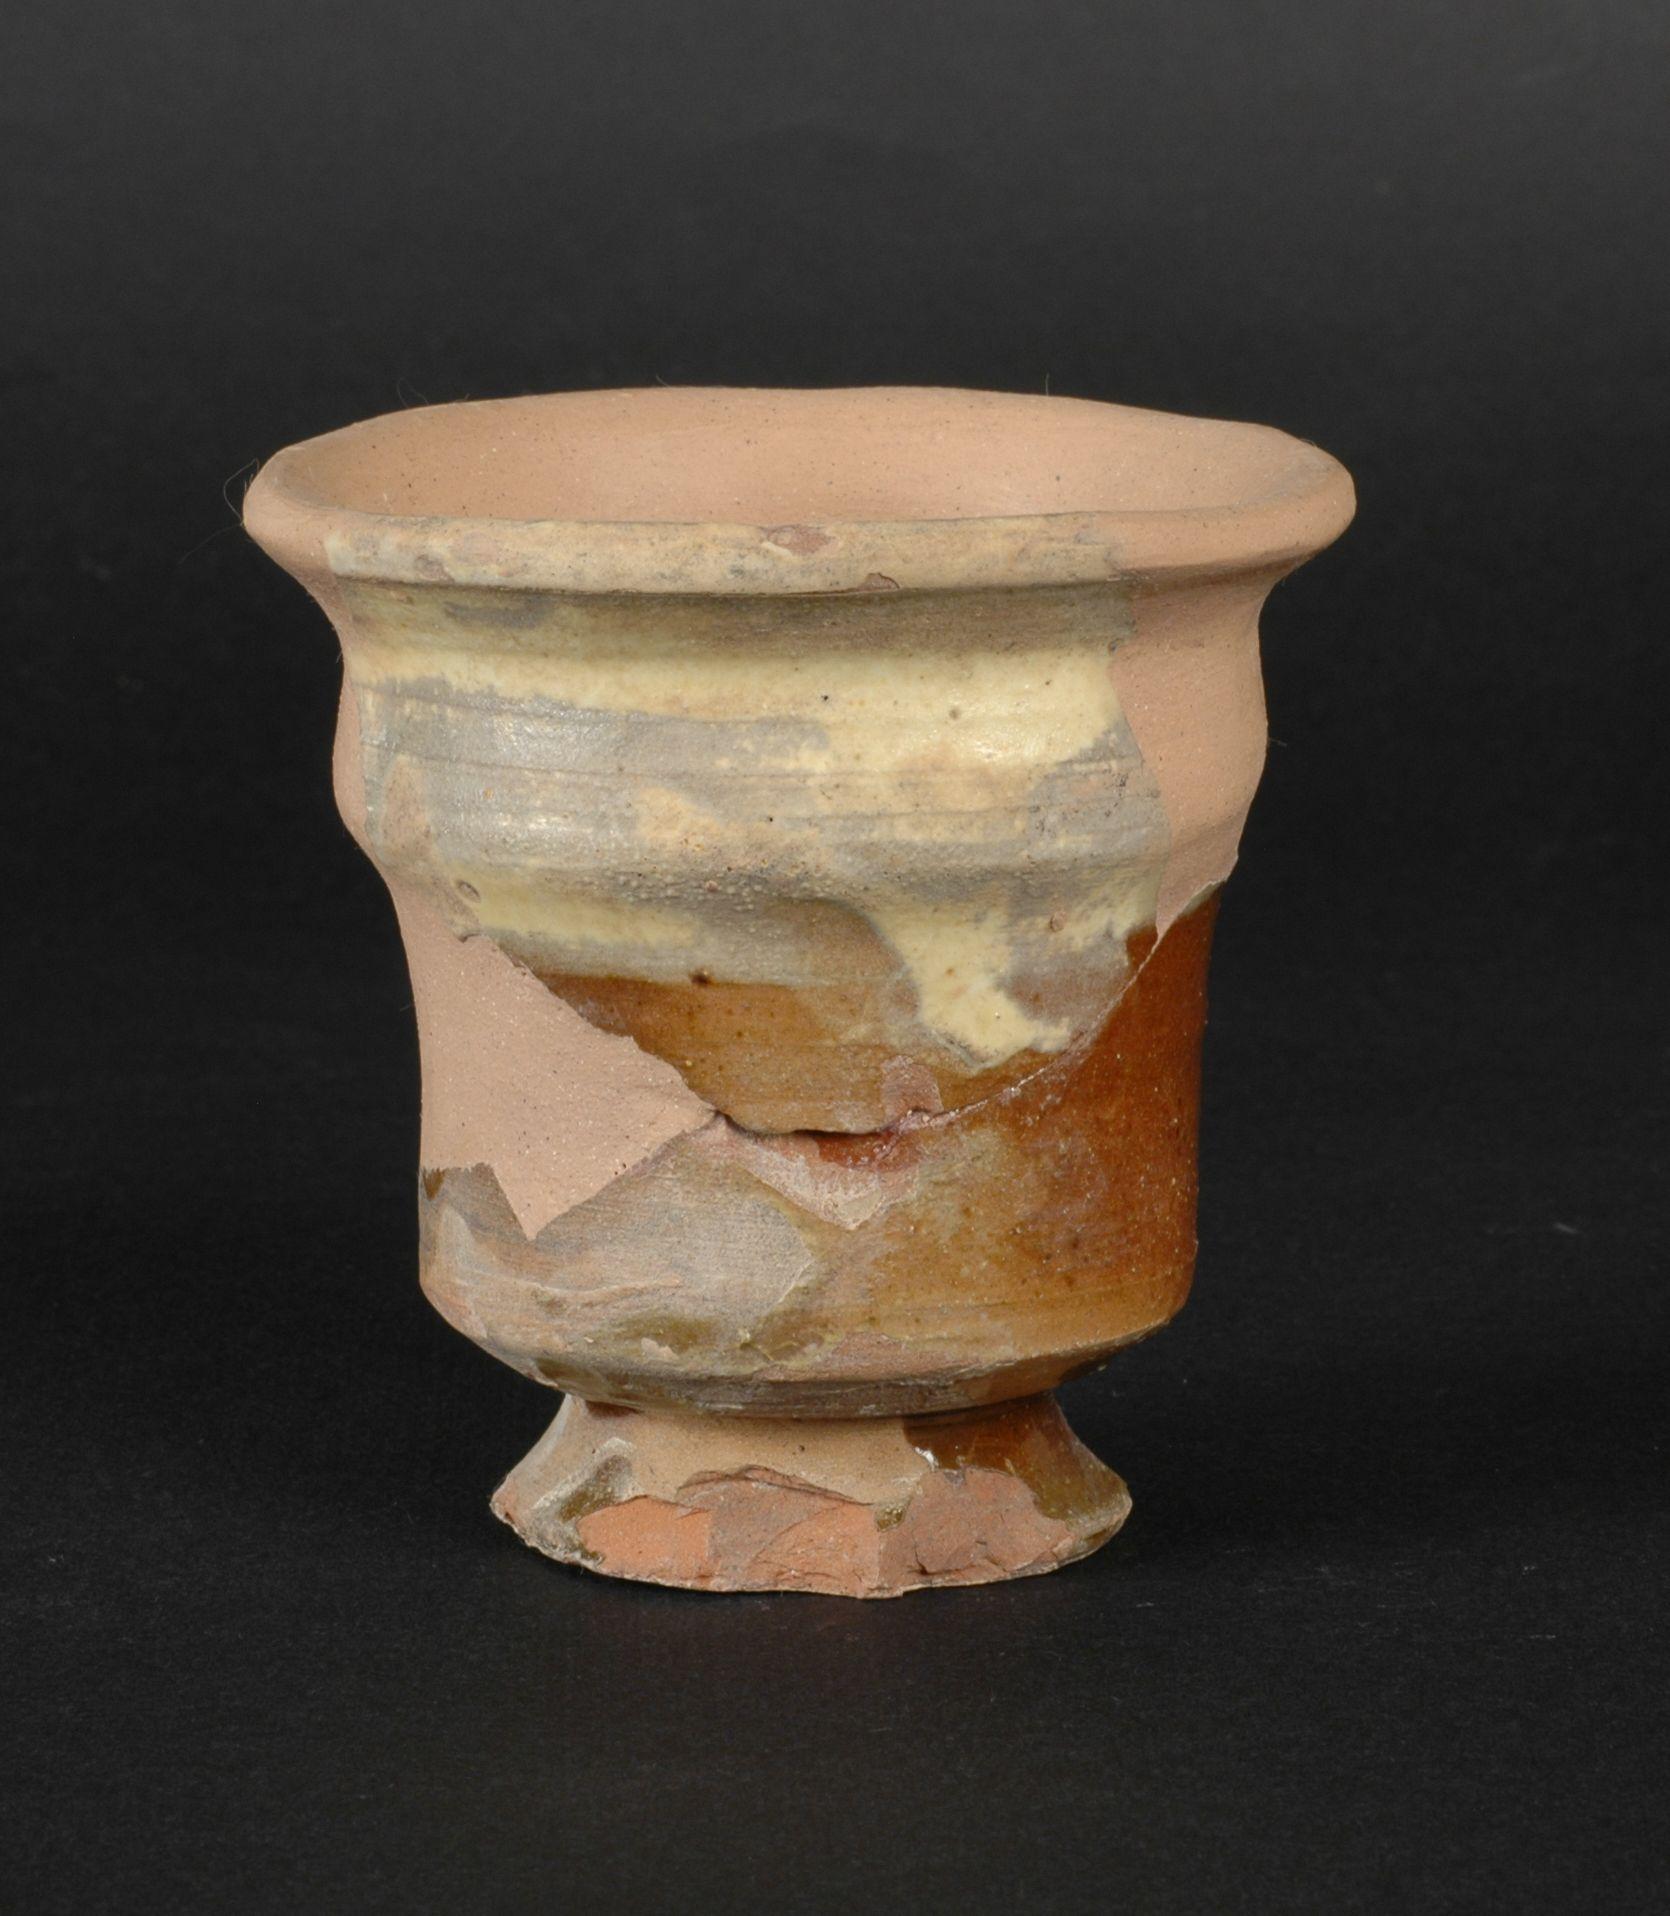 vaso - acroma depurata, opera isolata - ambito toscano (secc. XVI/ XVII)